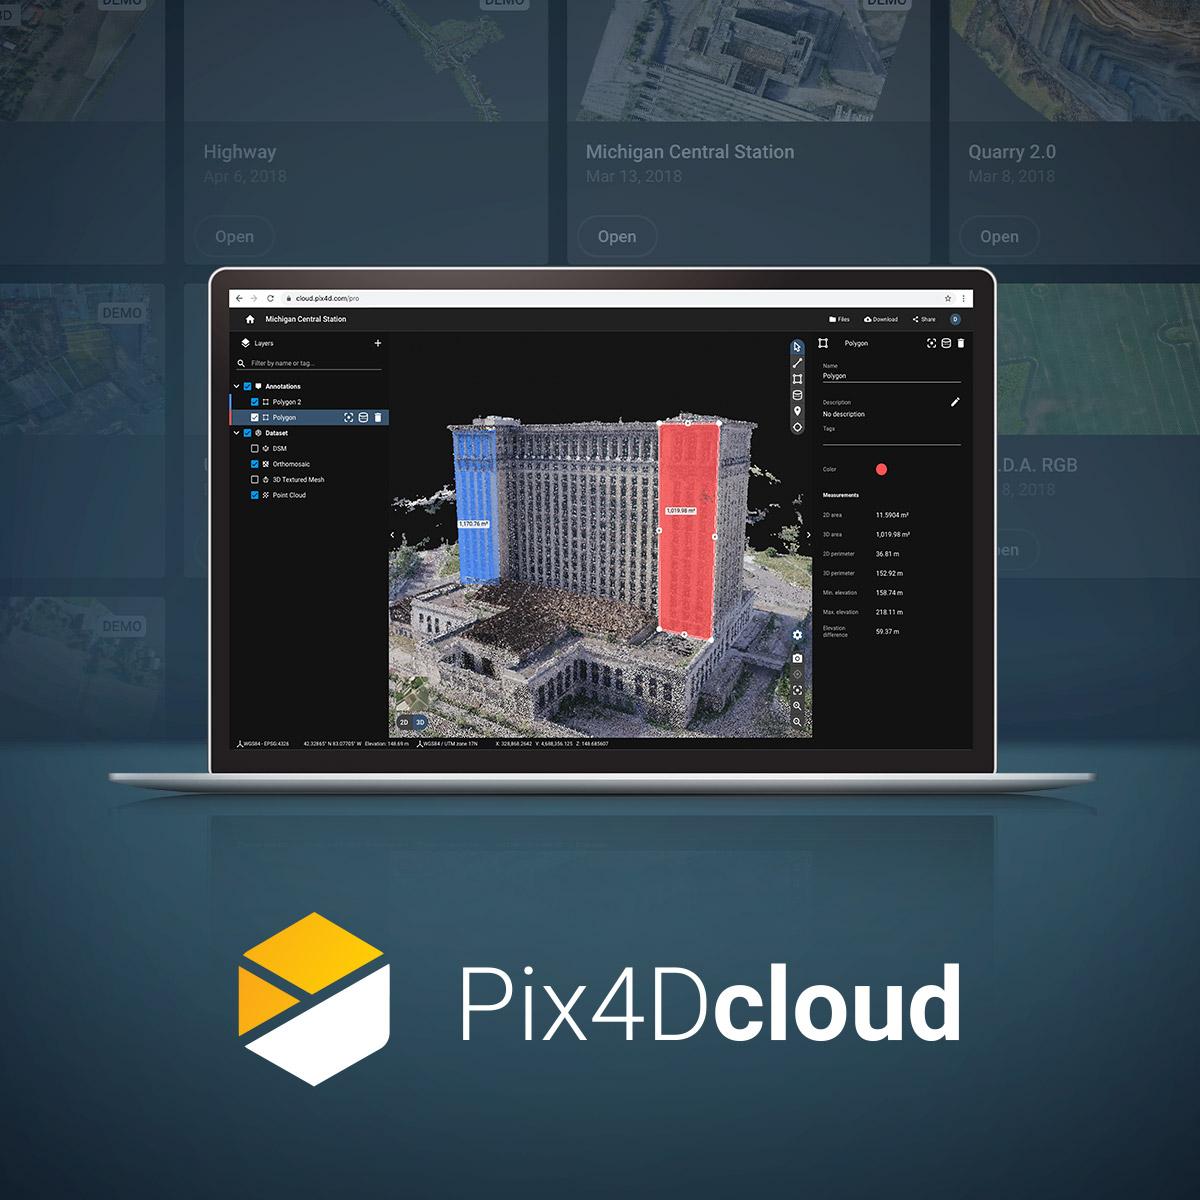 Pix4Dがスタンドアロンのフォトグラメトリー(SfM)クラウド処理ソリューションをリリース